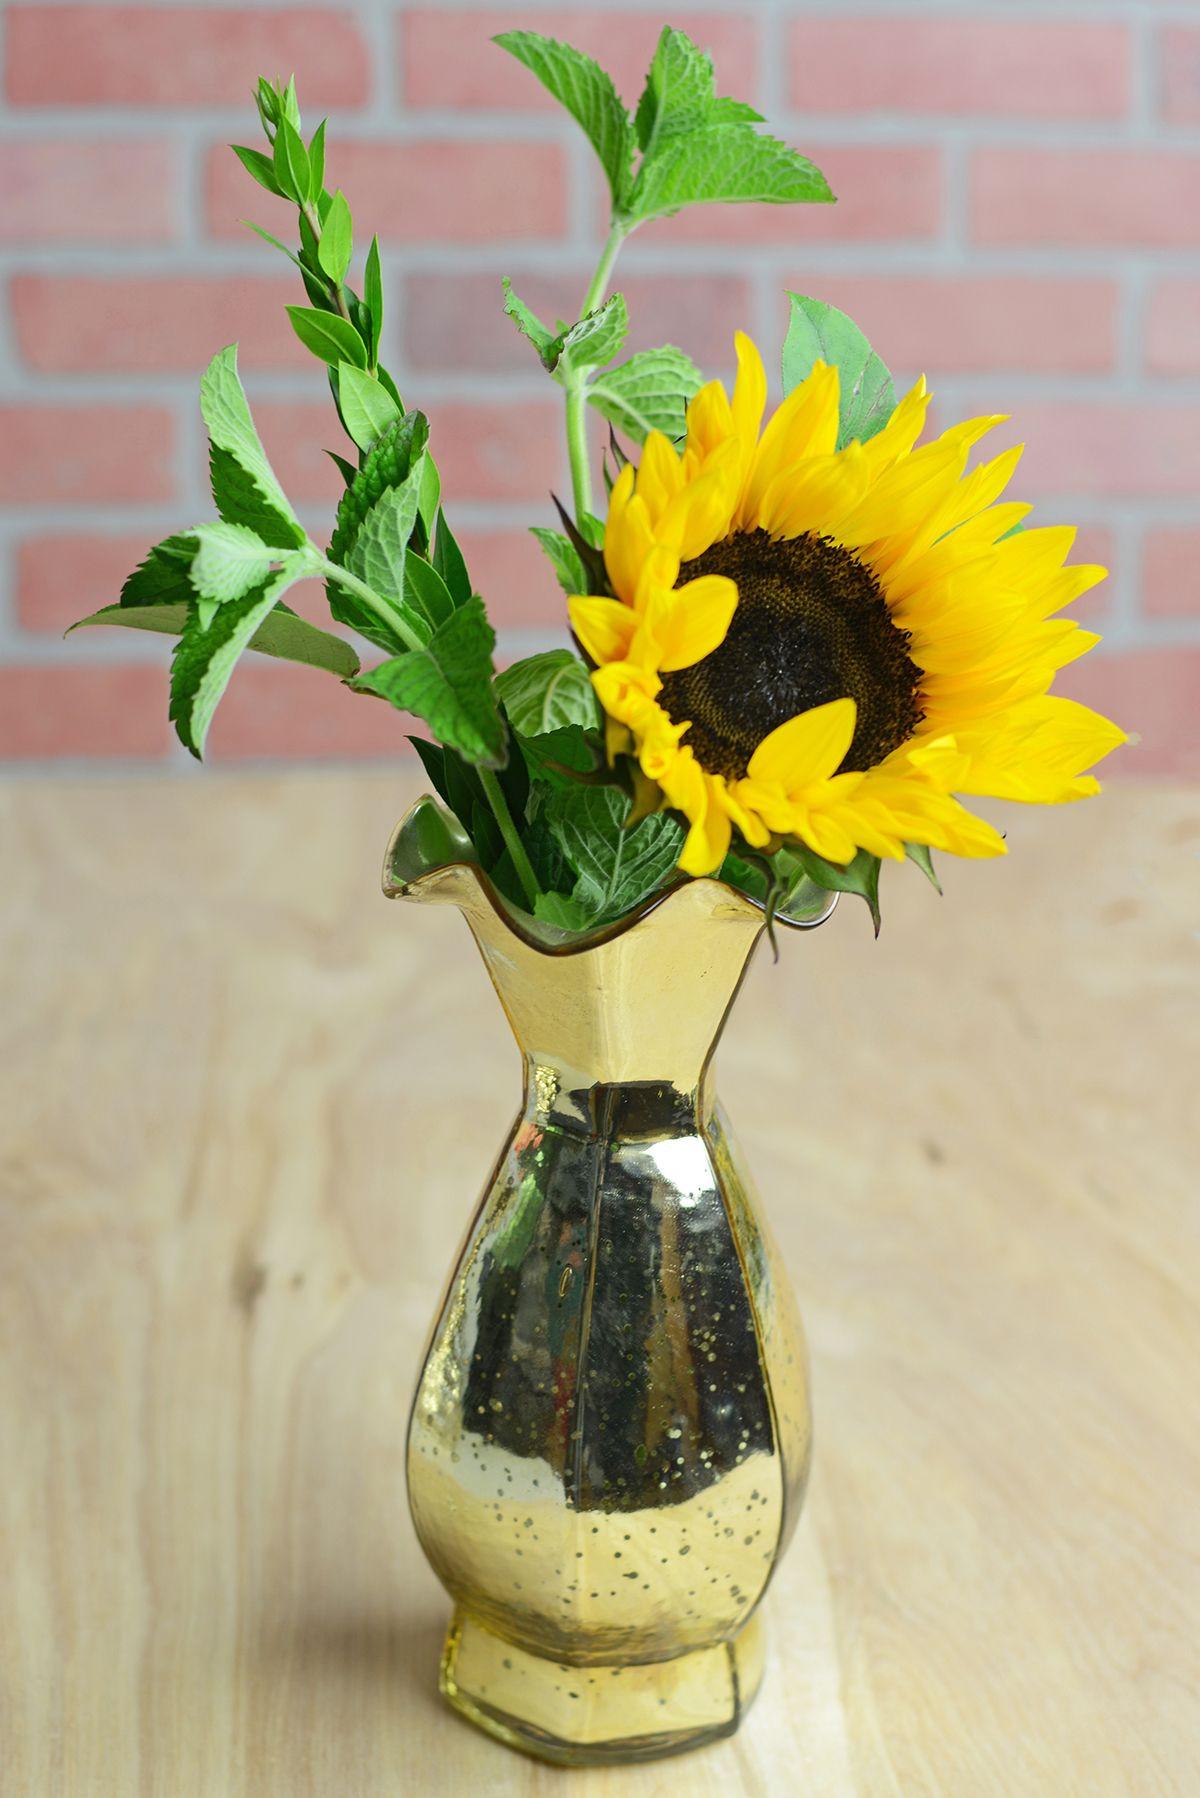 mercury glass floor vase of discount vases containers bowls save on crafts wedding within discount vases containers bowls save on crafts tall glass vaseswedding lanternsmercury